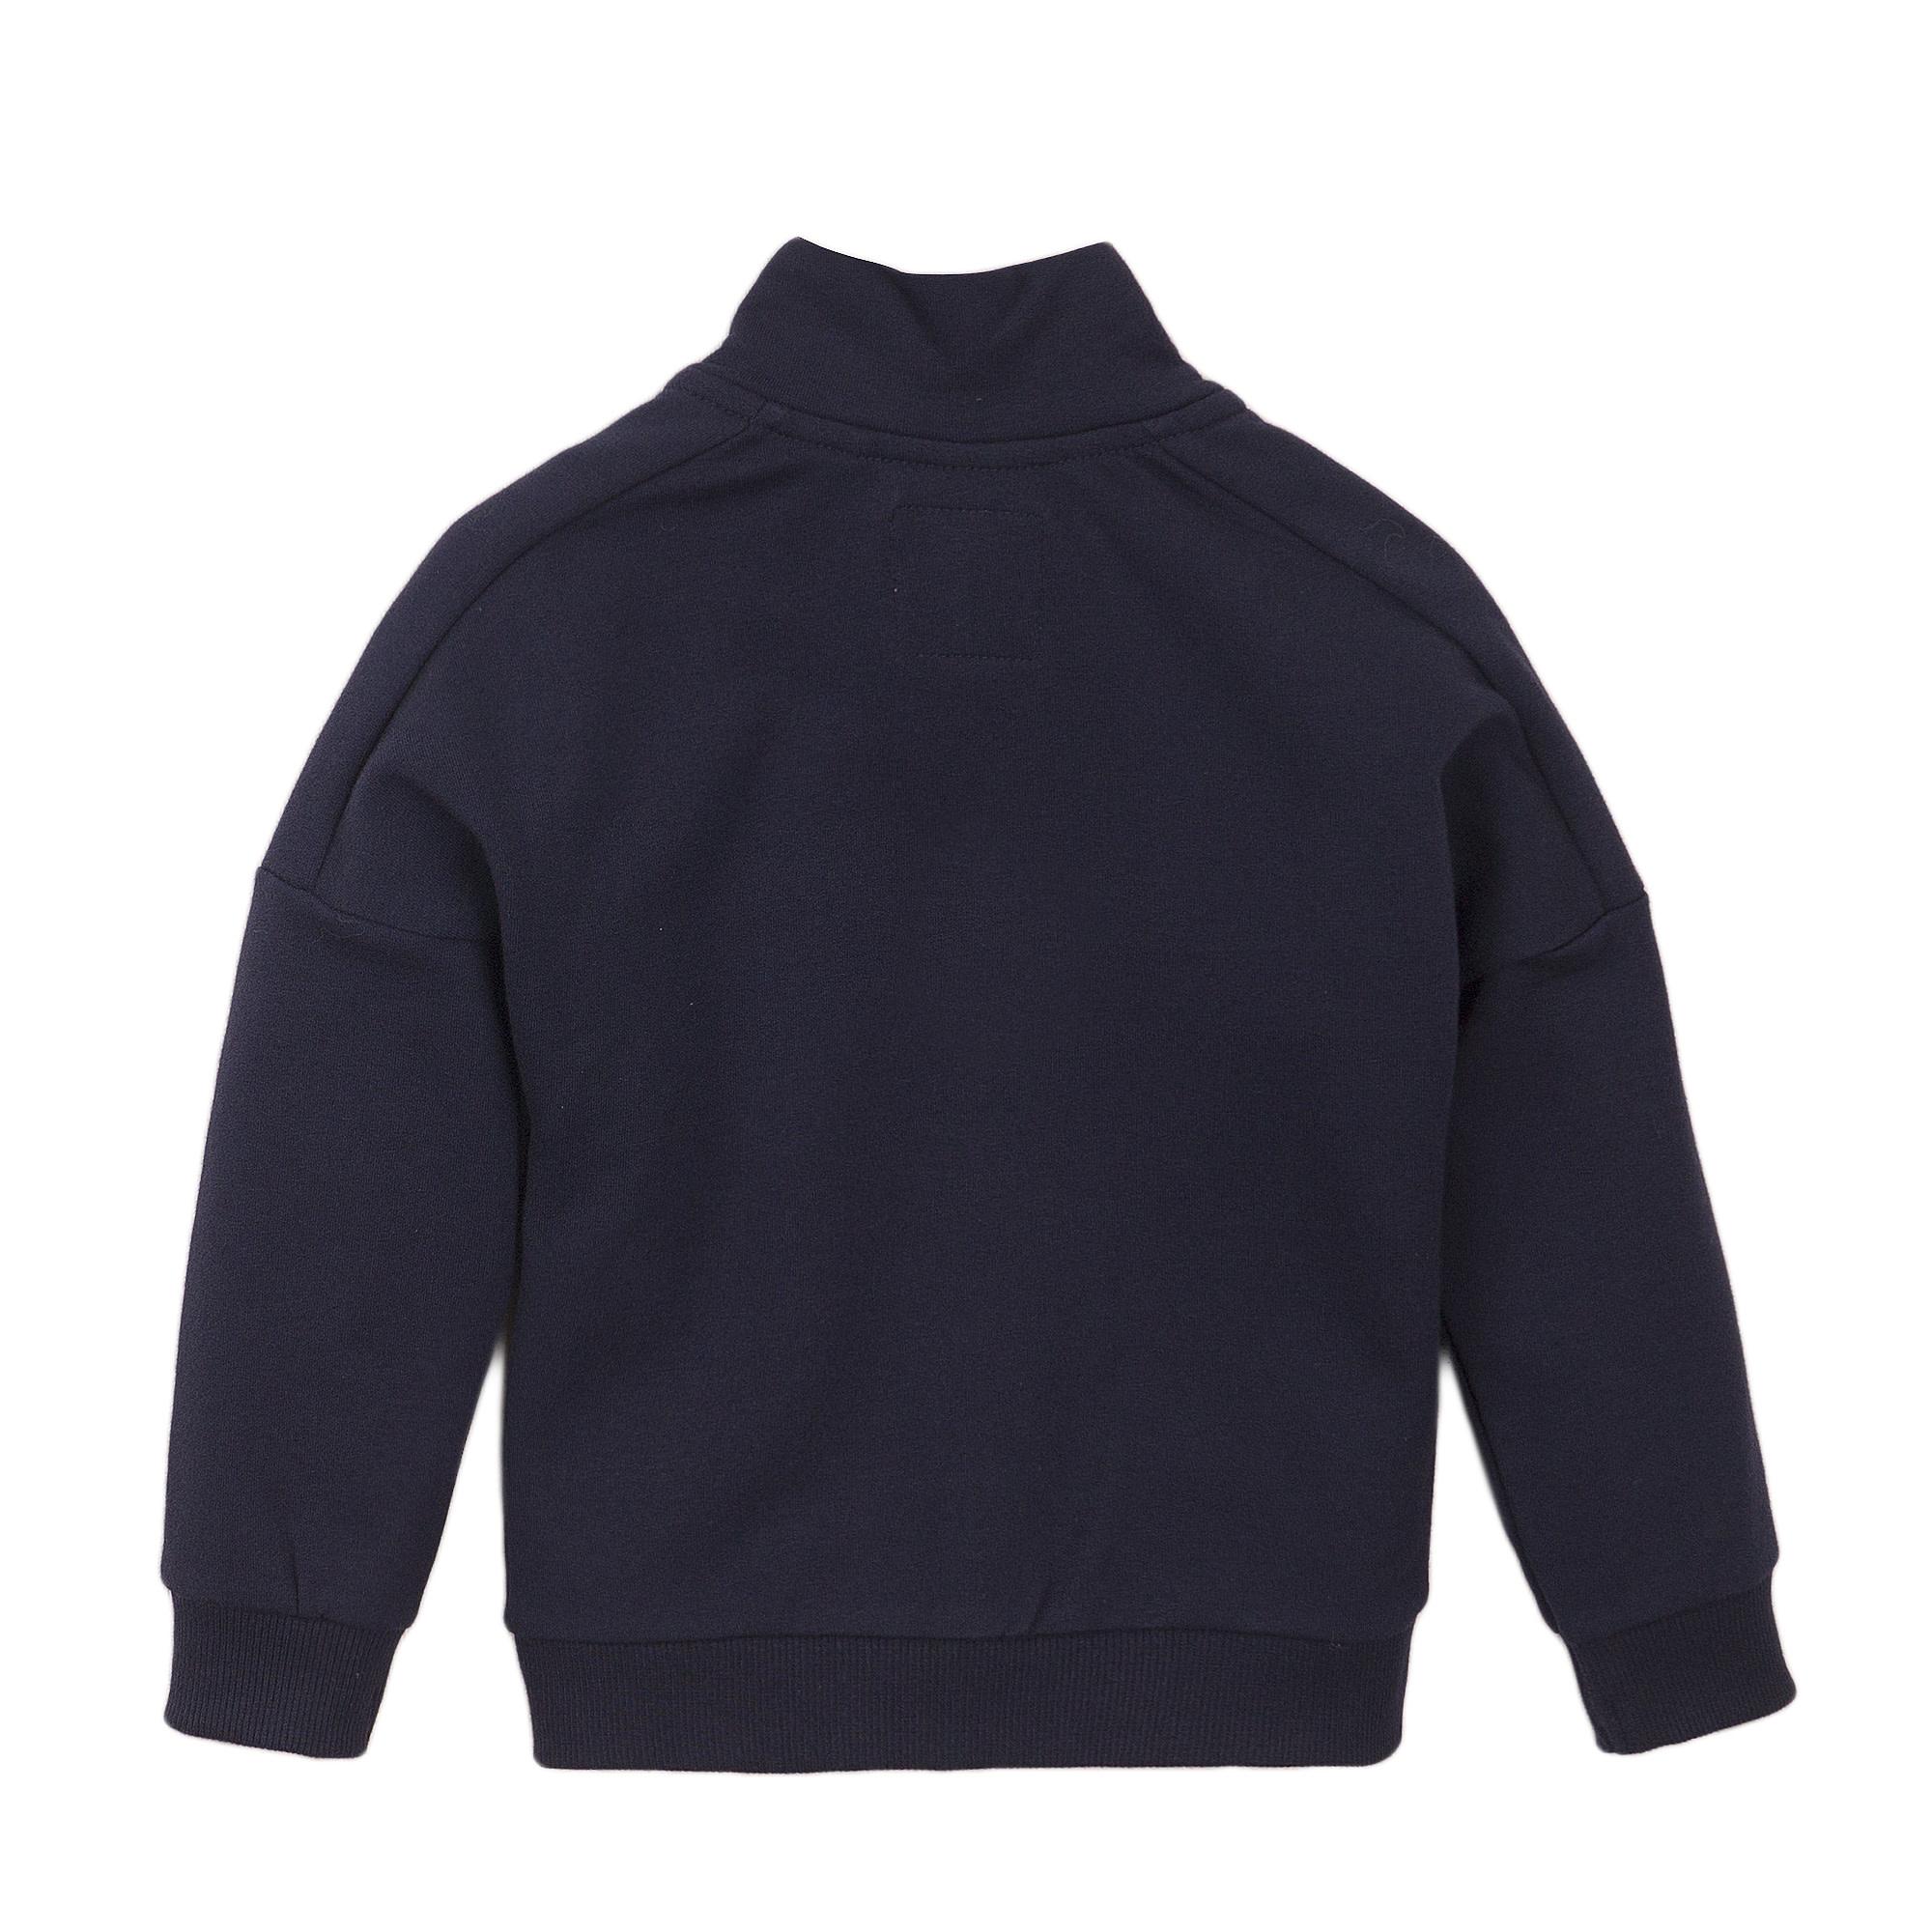 Navy Bomber Style Sweater